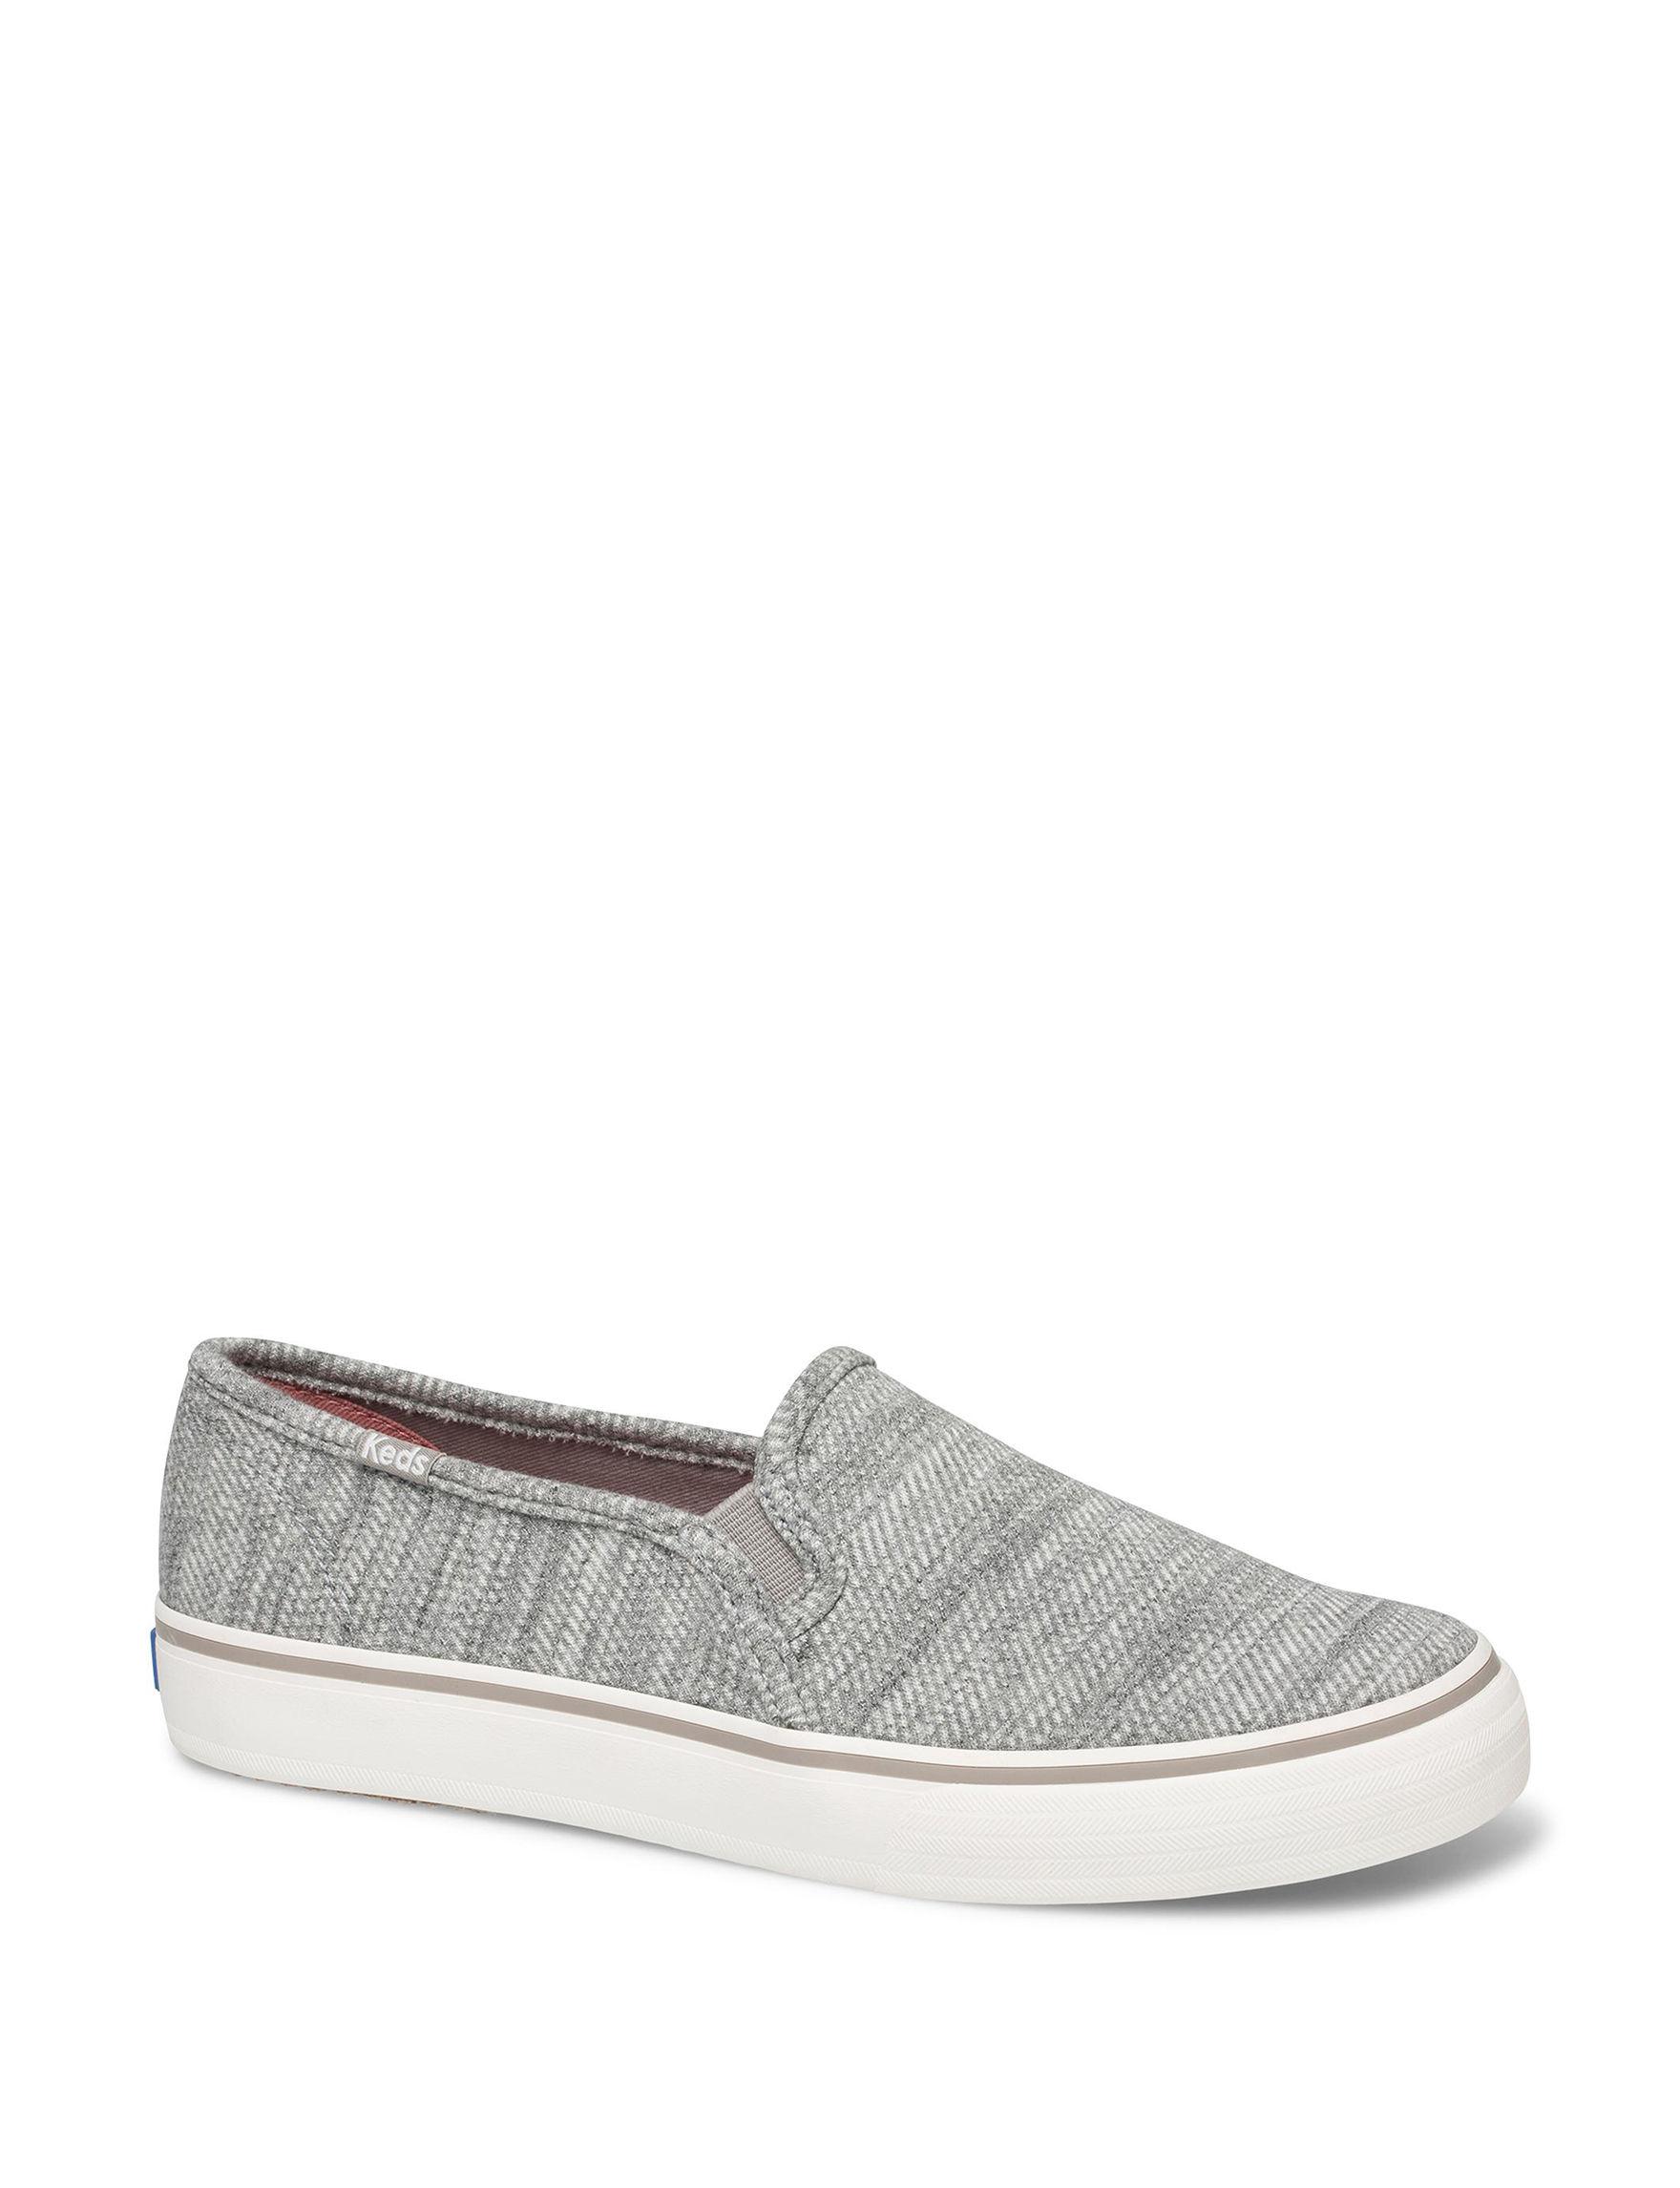 Keds Grey Comfort Shoes